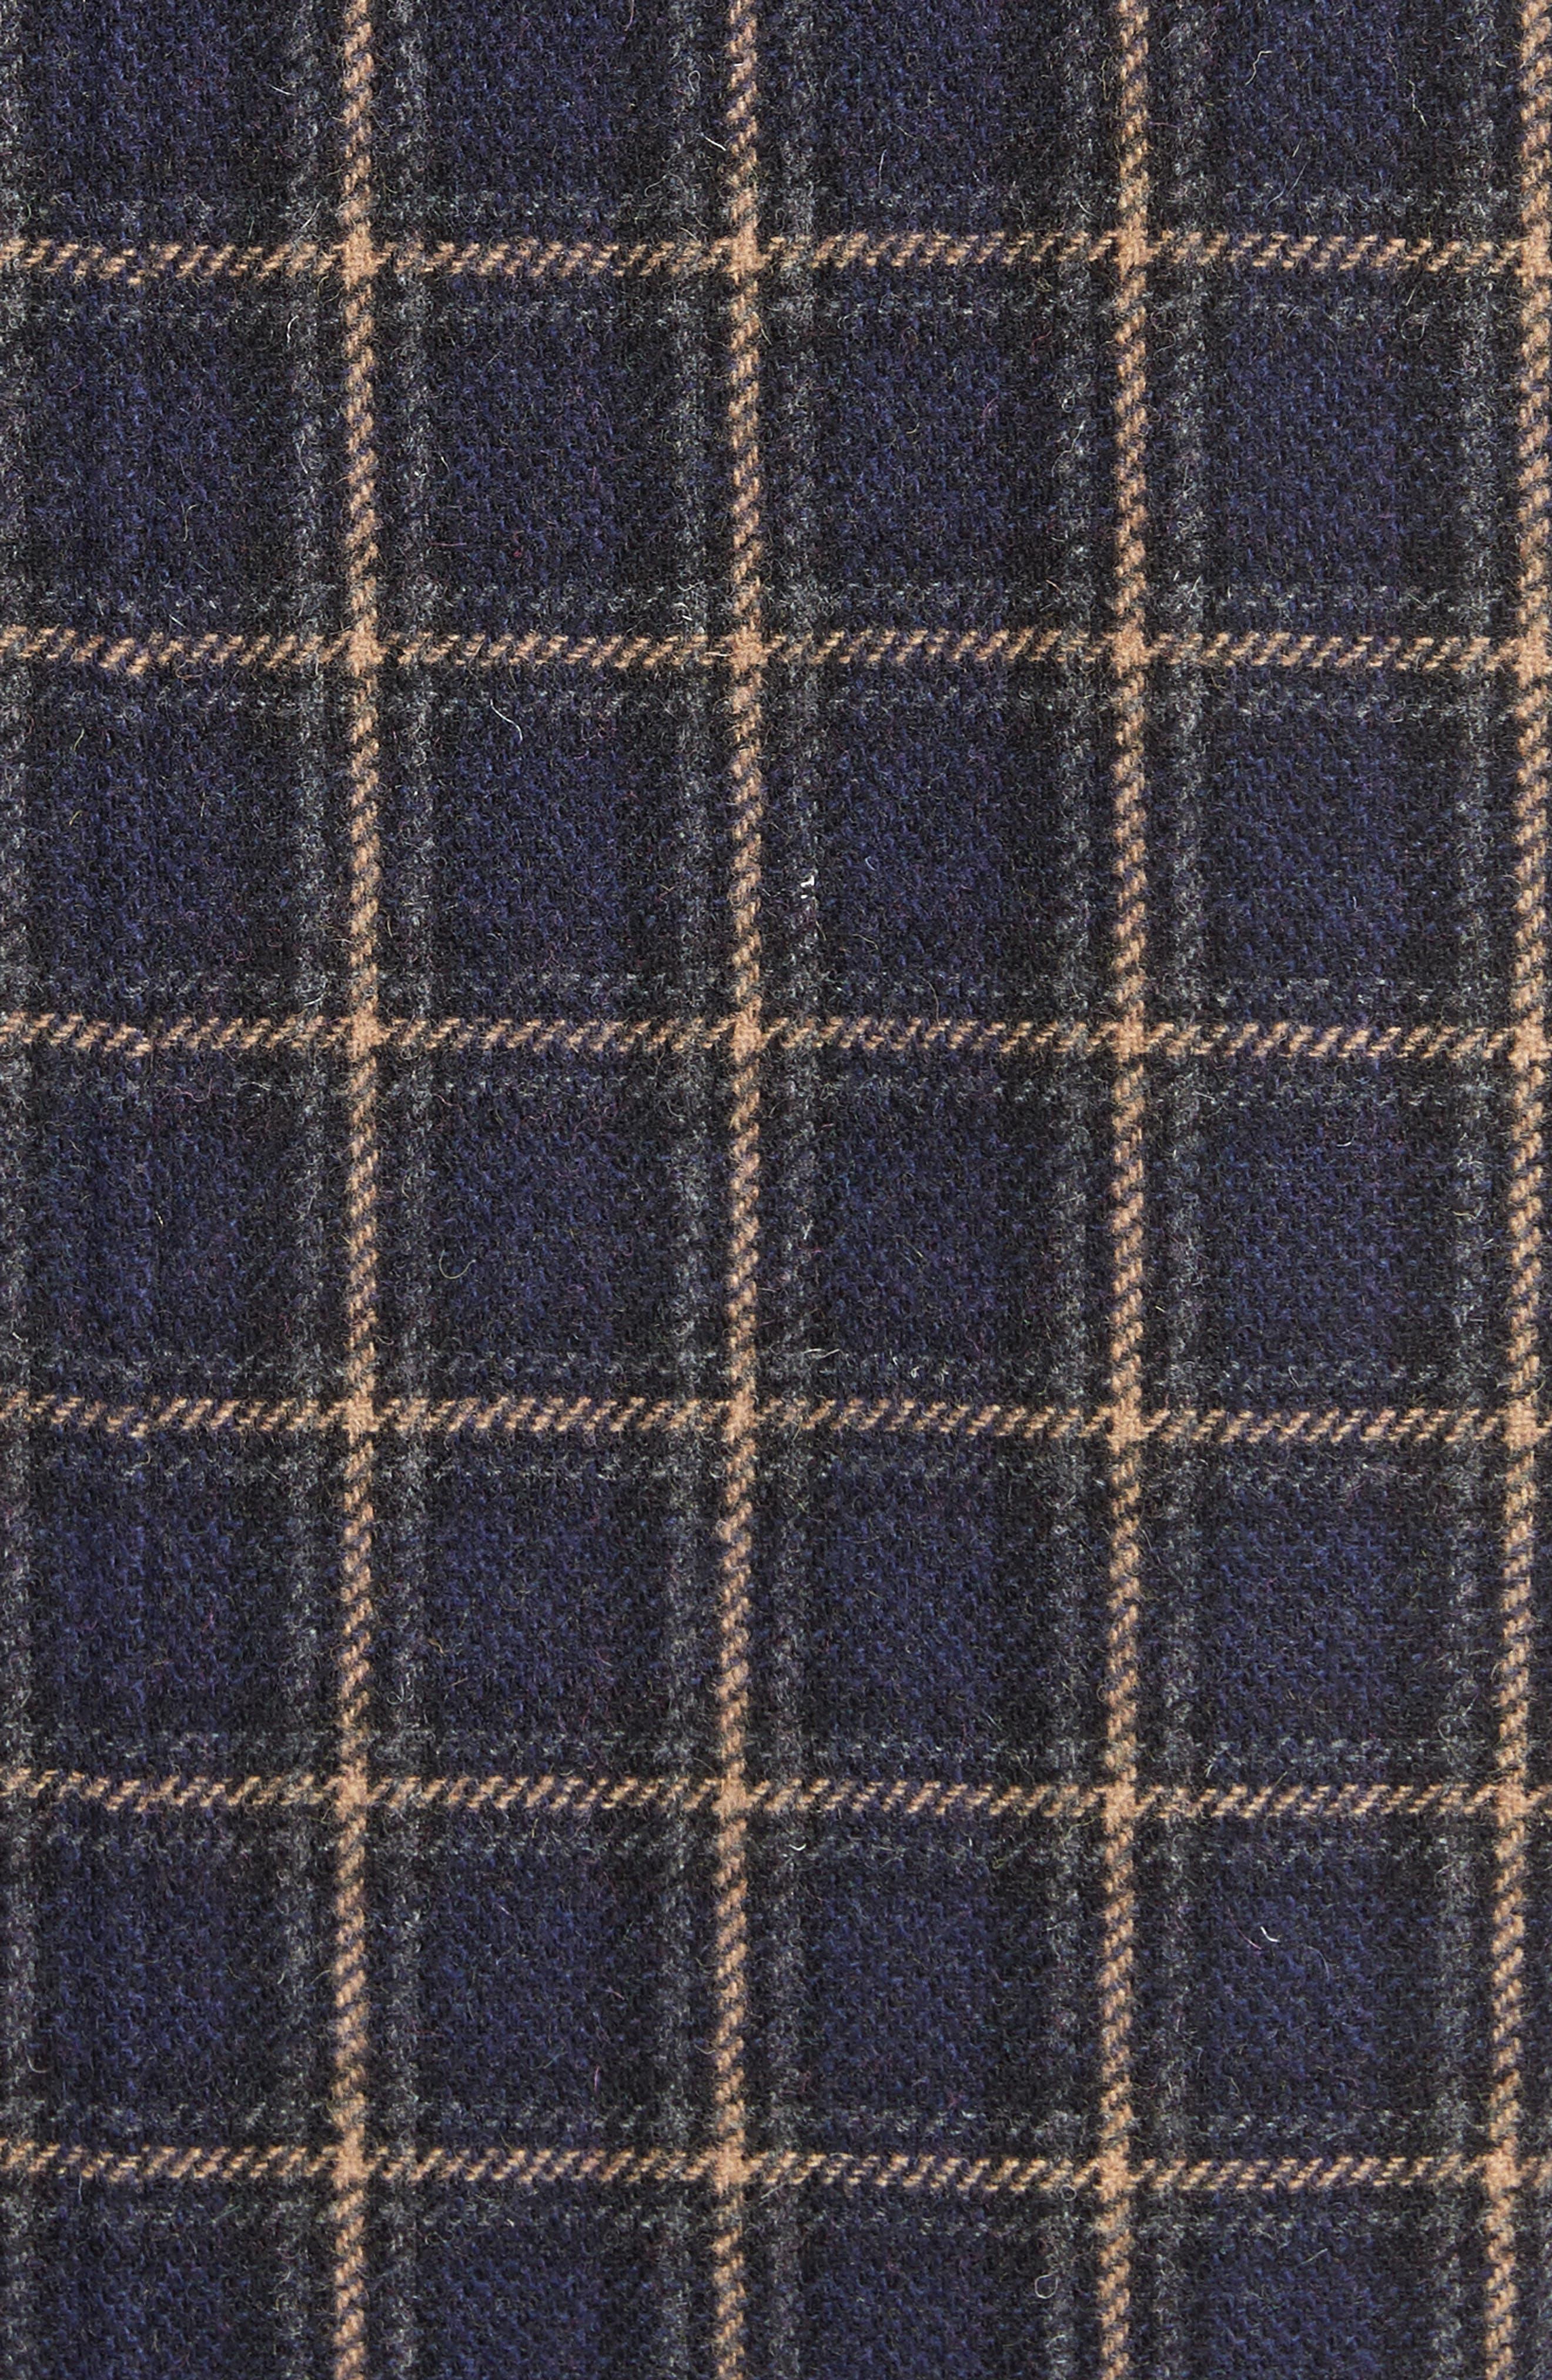 Plaid Wool Blend Car Coat,                             Alternate thumbnail 6, color,                             960